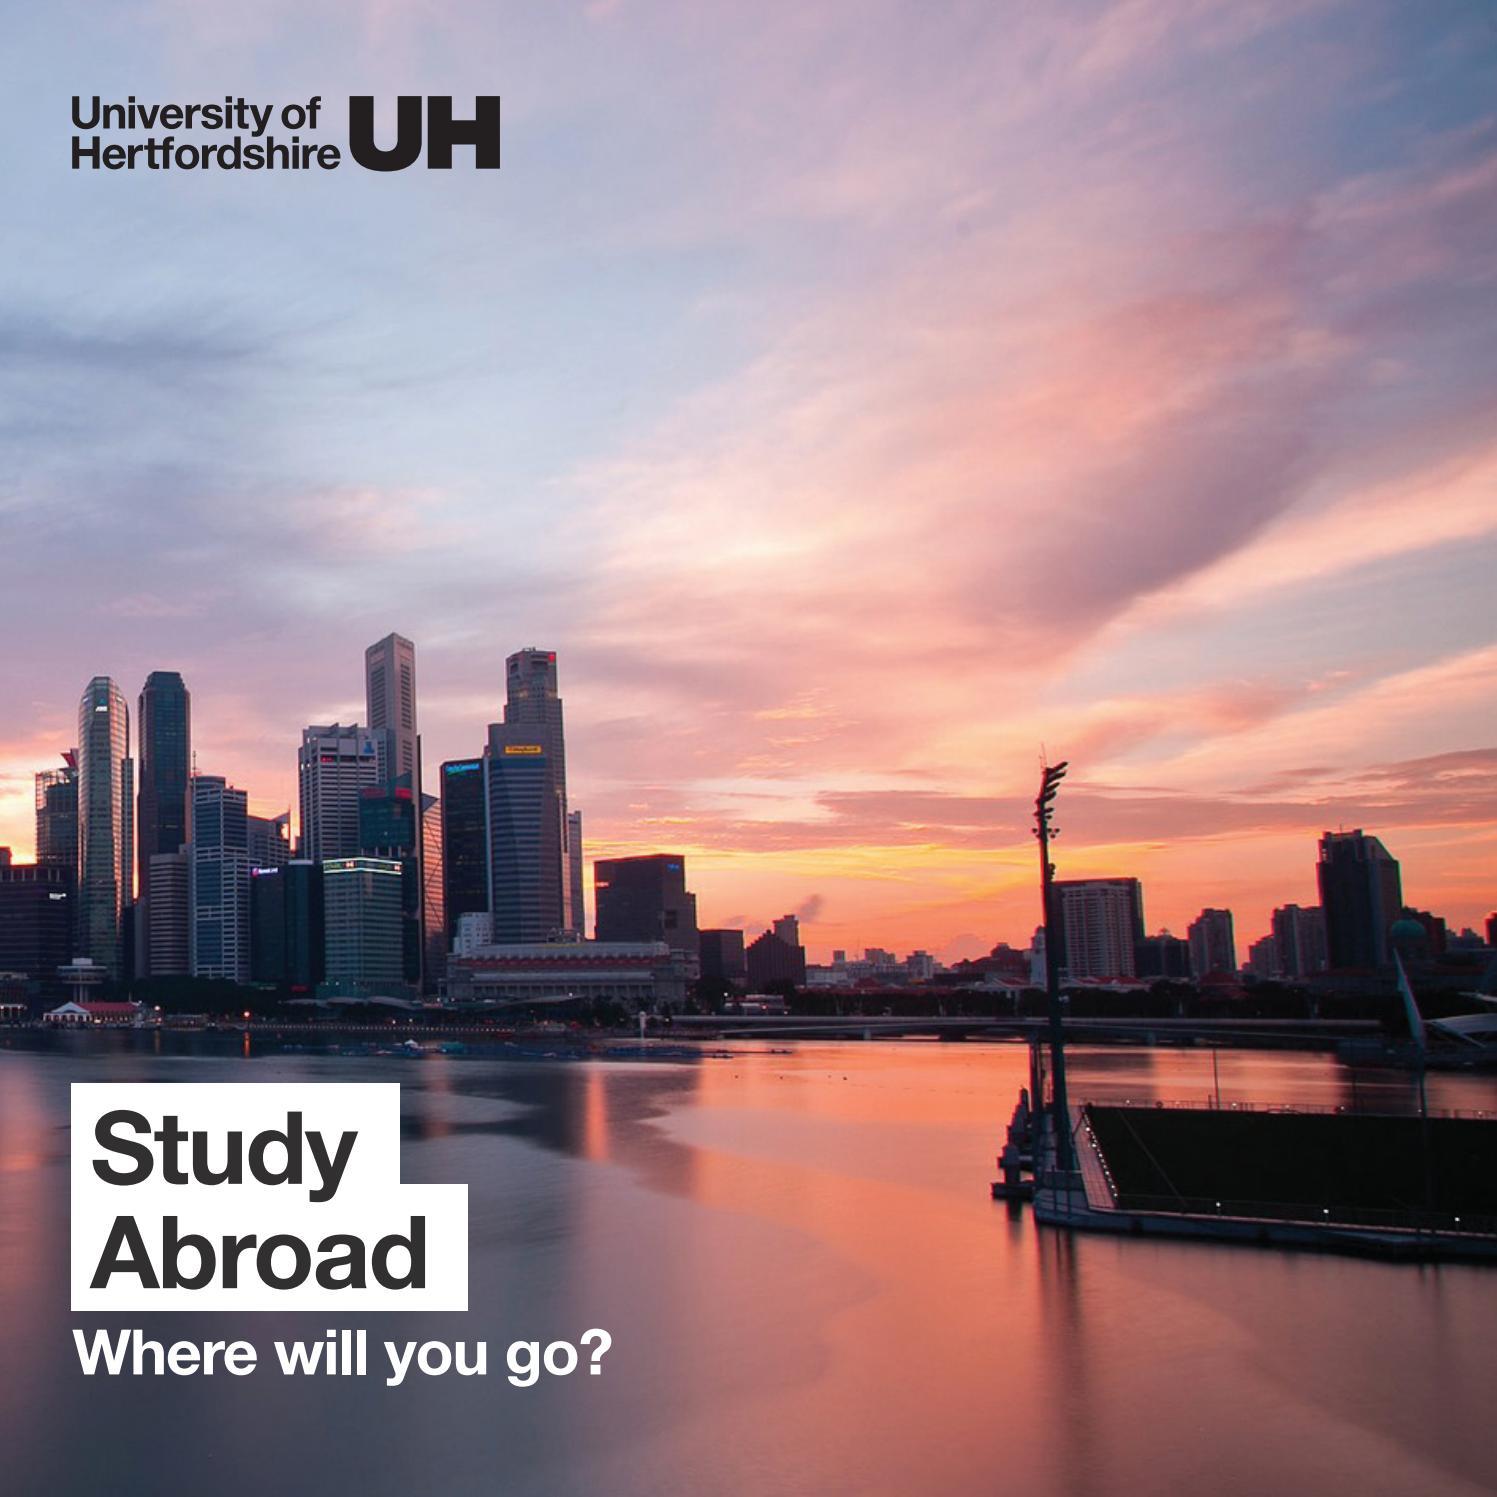 Study Abroad - University of Hertfordshire by University of